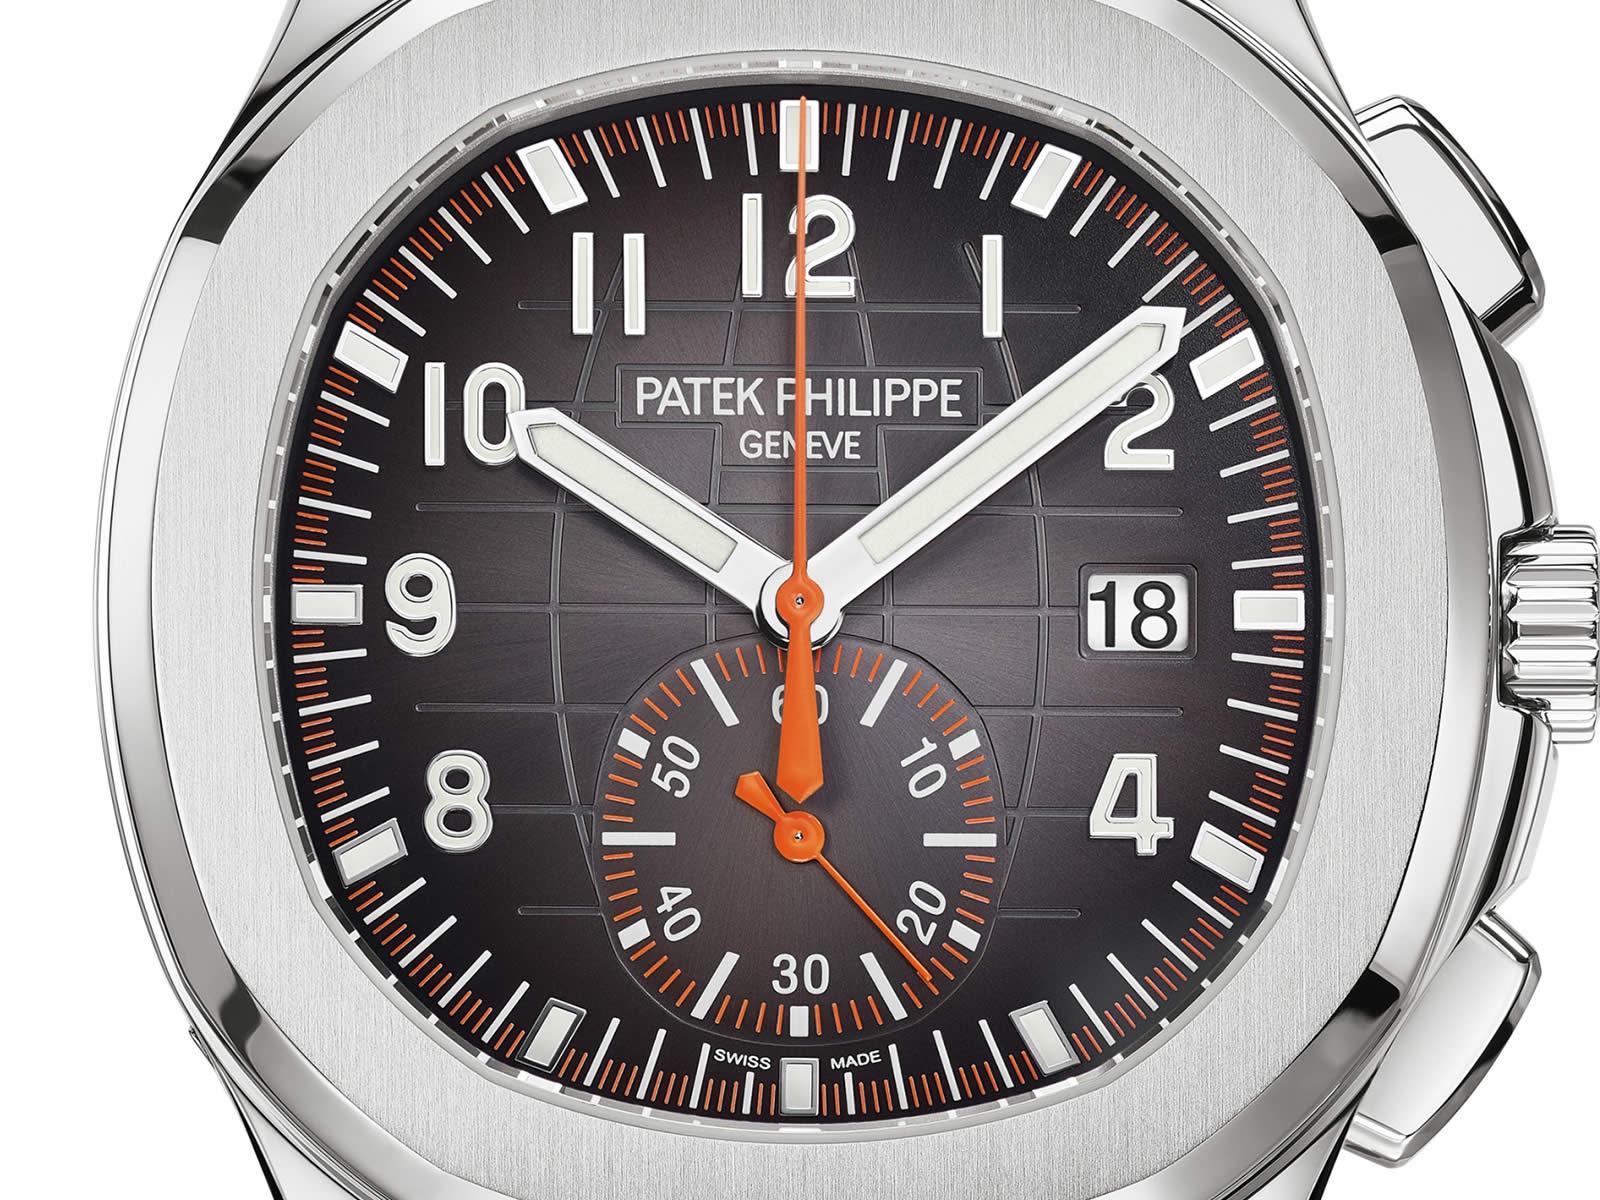 5968a-patek-philippe-aquanaut-chronograph-4-.jpg